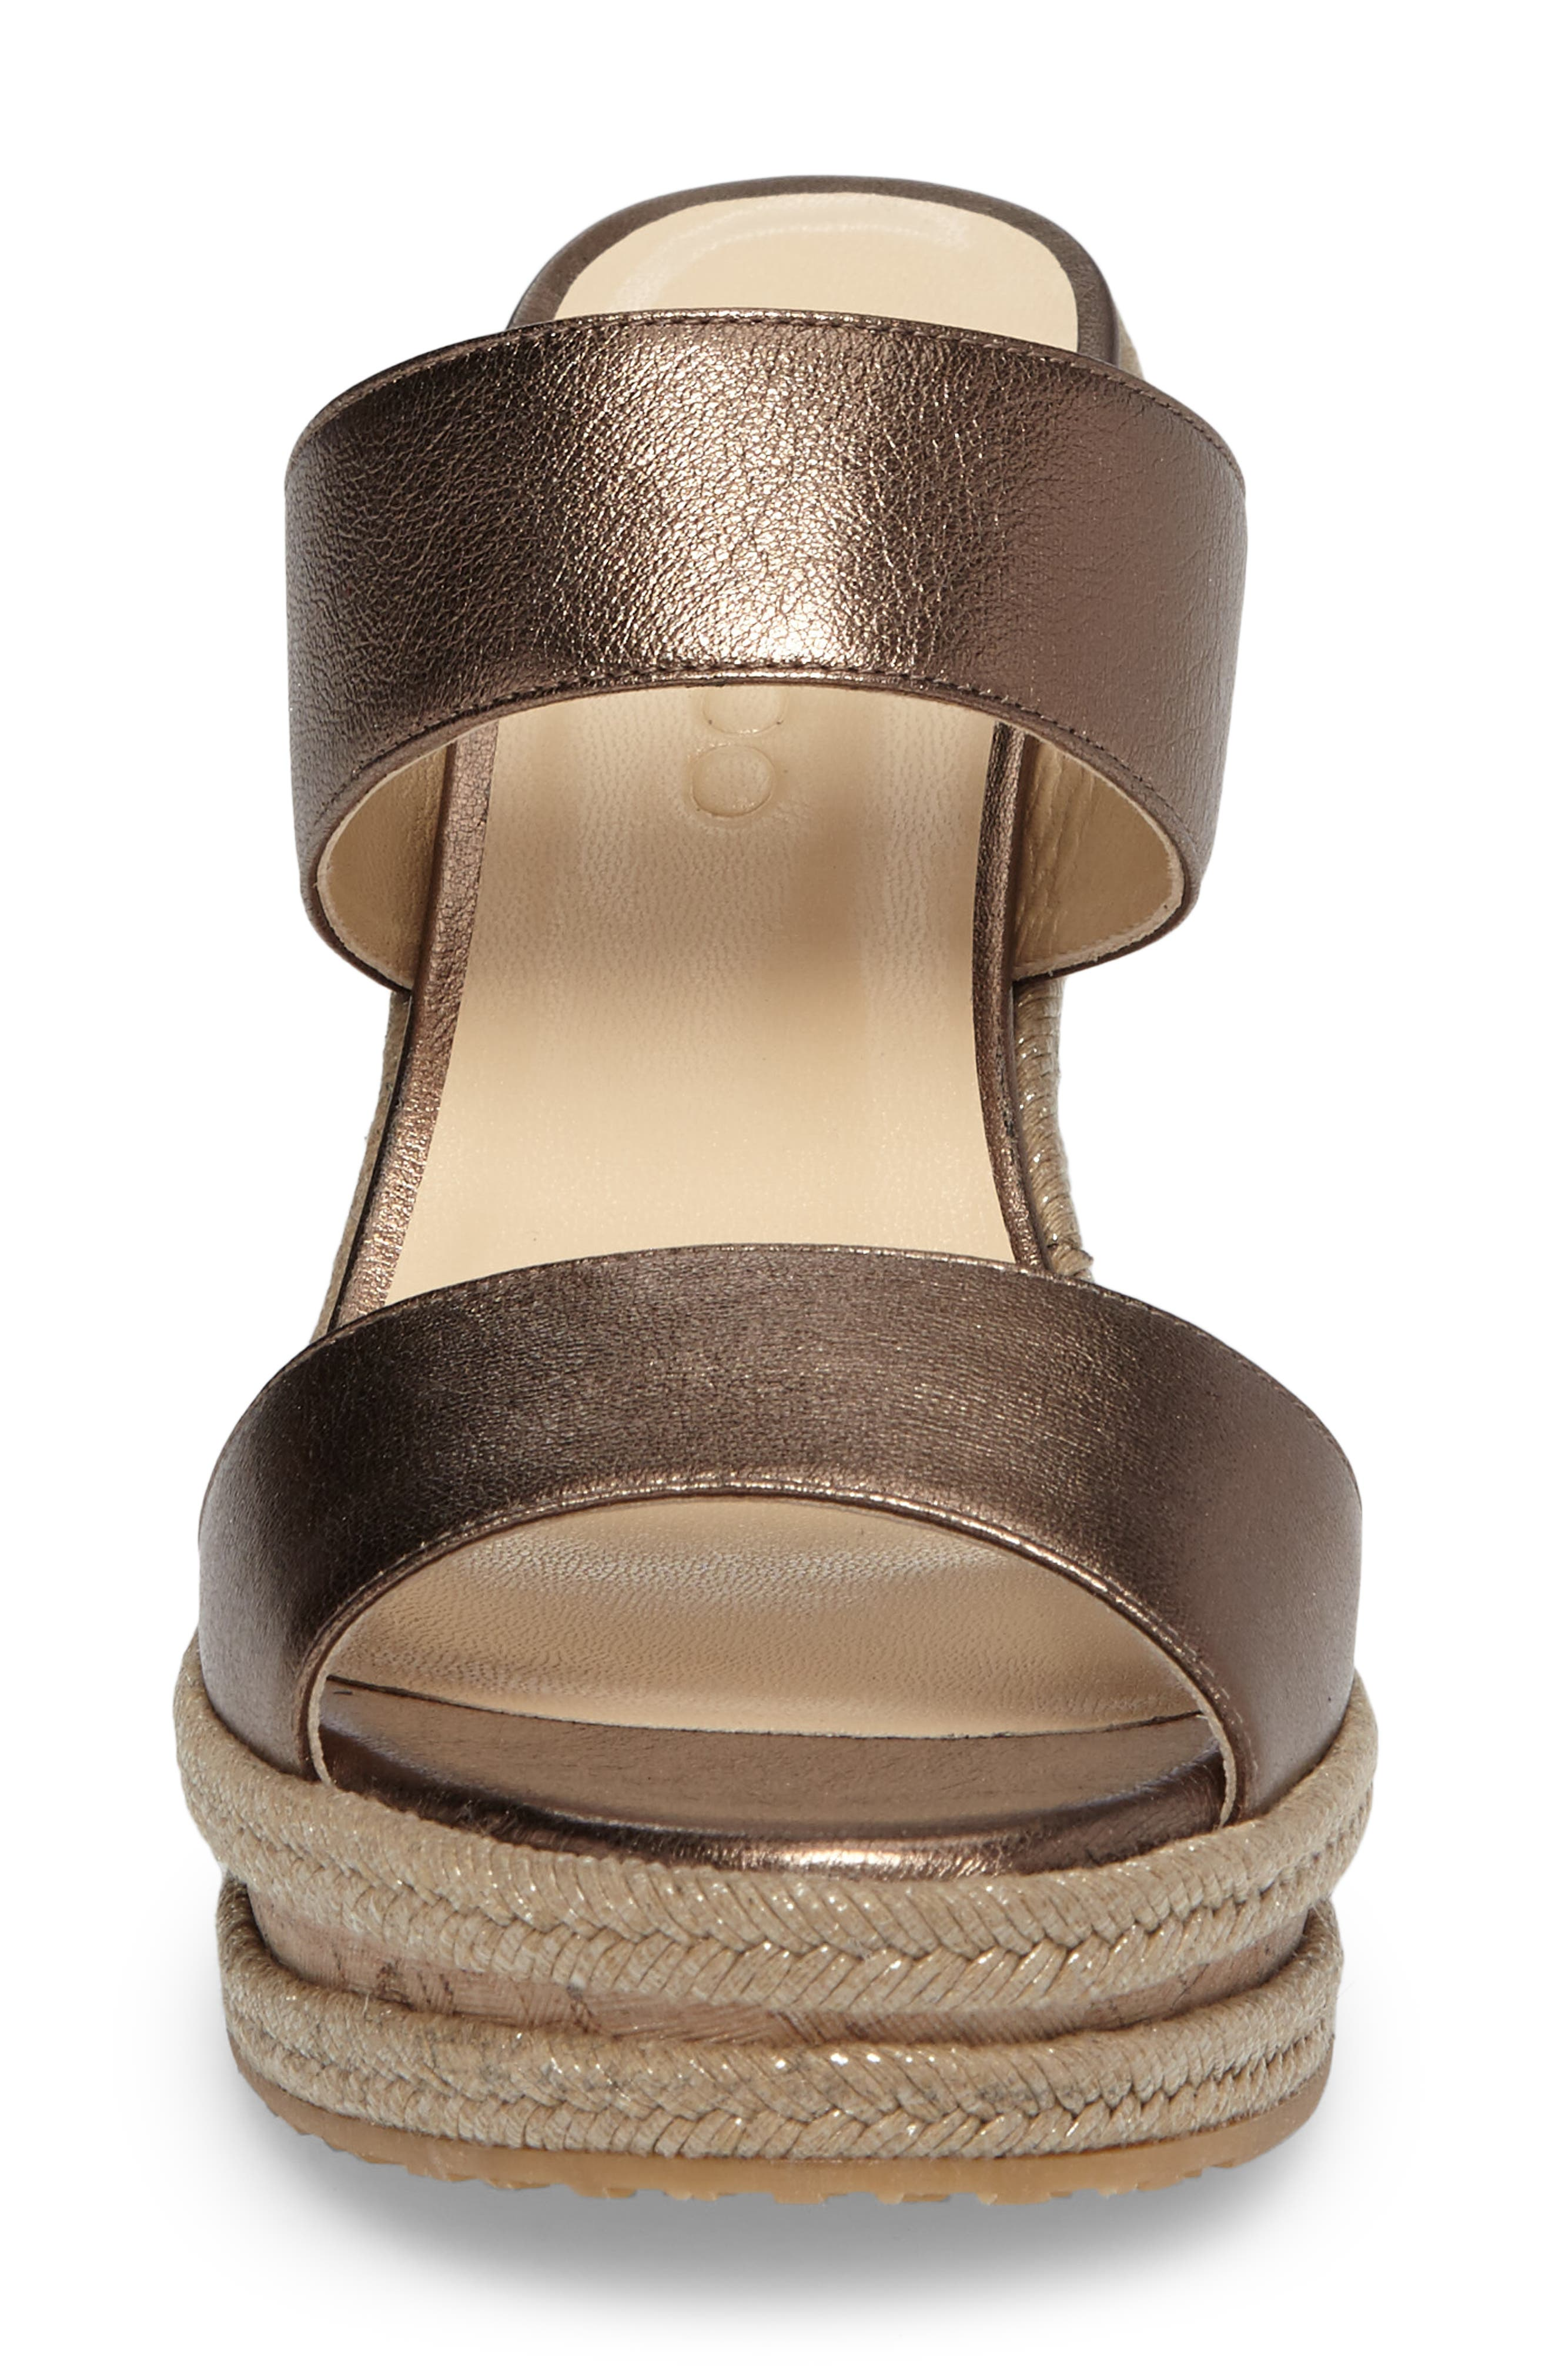 Parker Wedge Sandal,                             Alternate thumbnail 4, color,                             Antique Gold